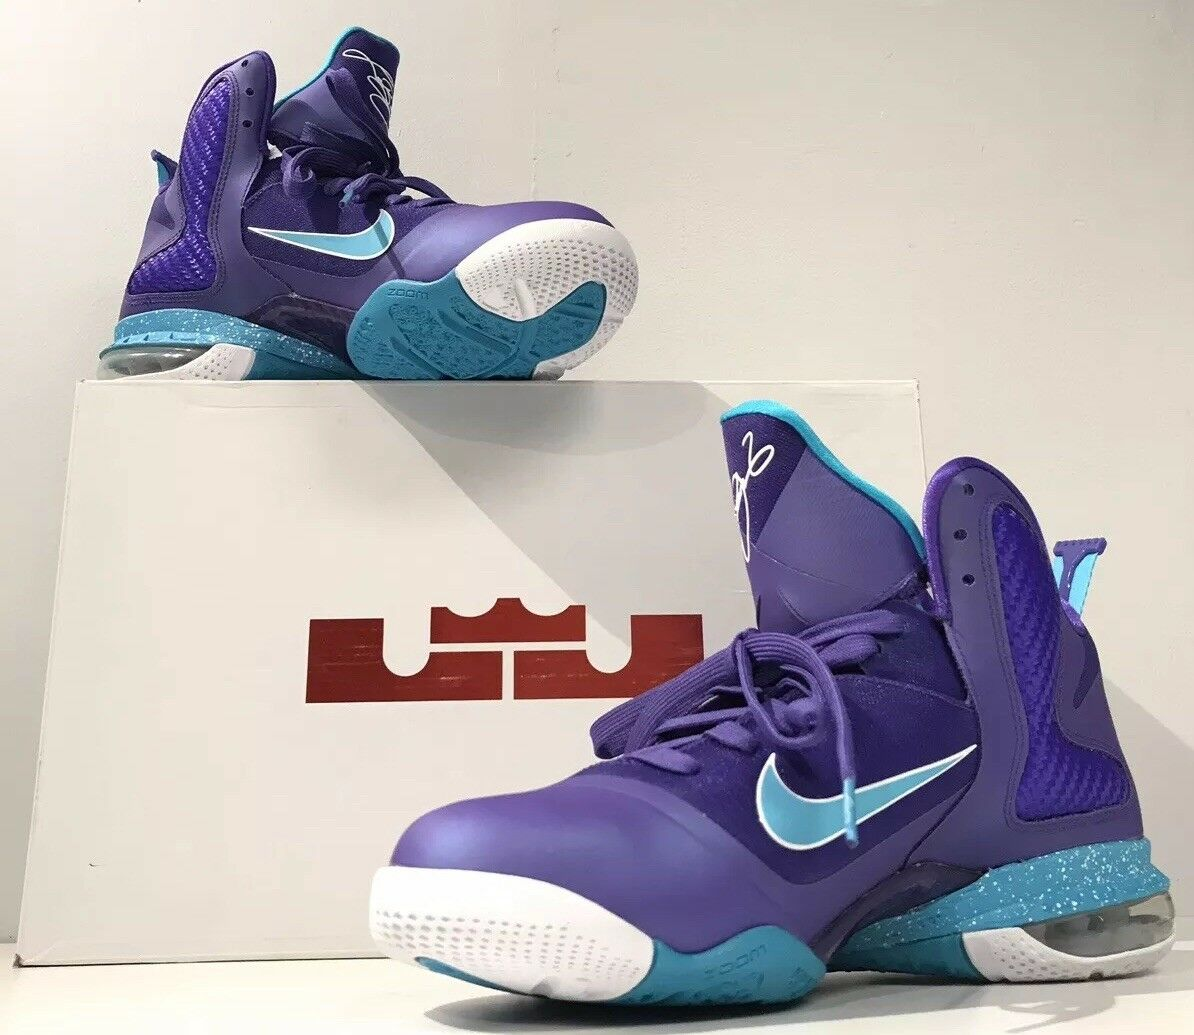 c0e5dceb0b1 Nike Nike Nike LeBron 9 'Summit Lake Hornets' Basketball shoes Sneakers -  Size 8.5